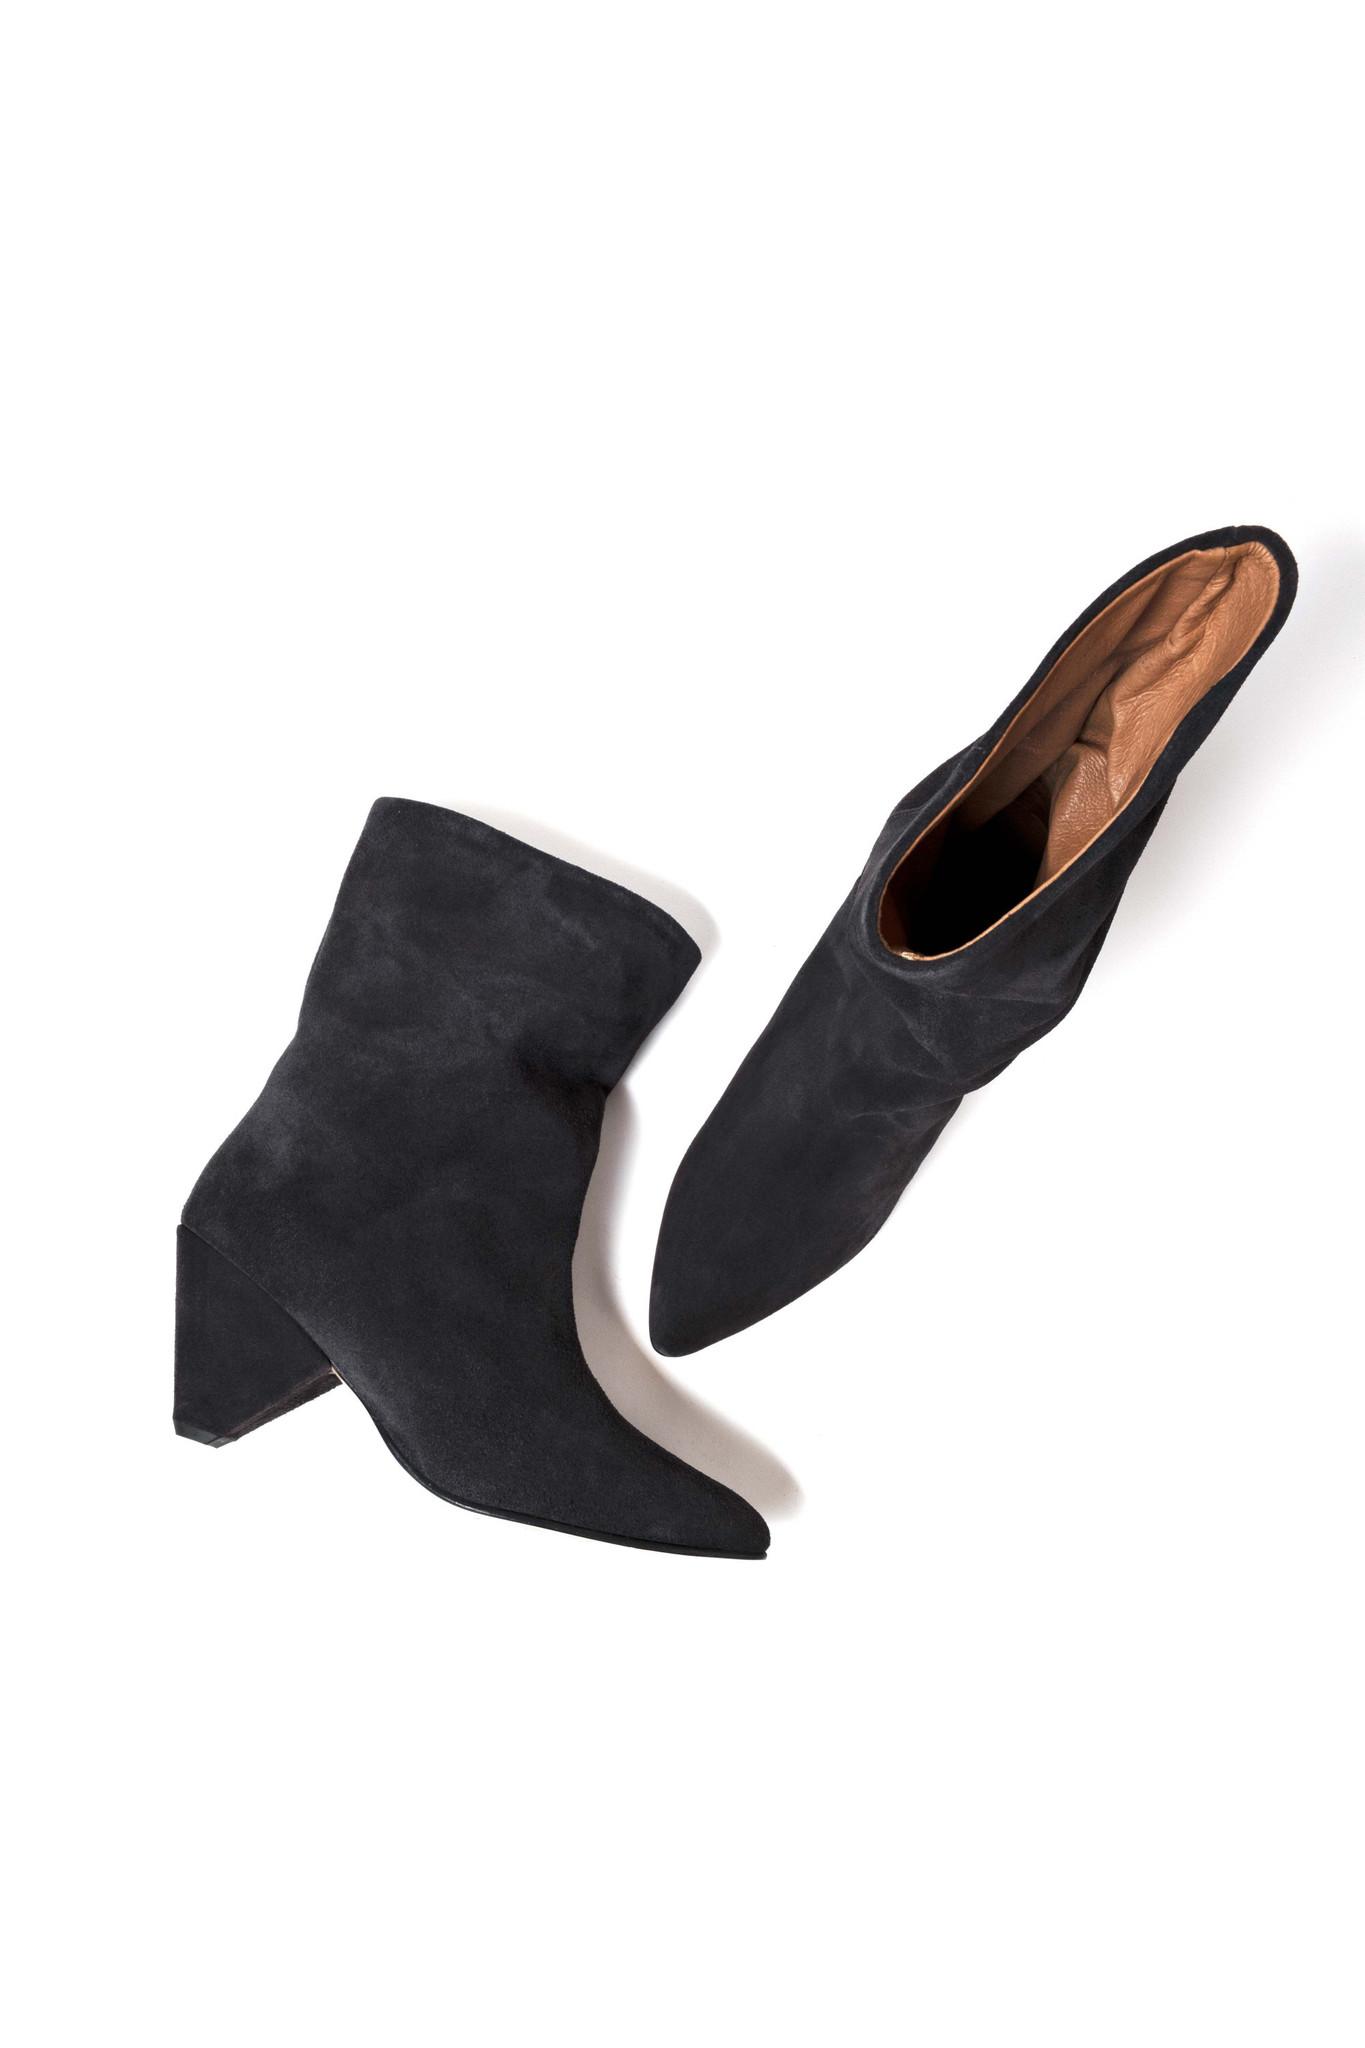 Vully 75 Triangle Calf Suede Boot - Dark Grey 38-4